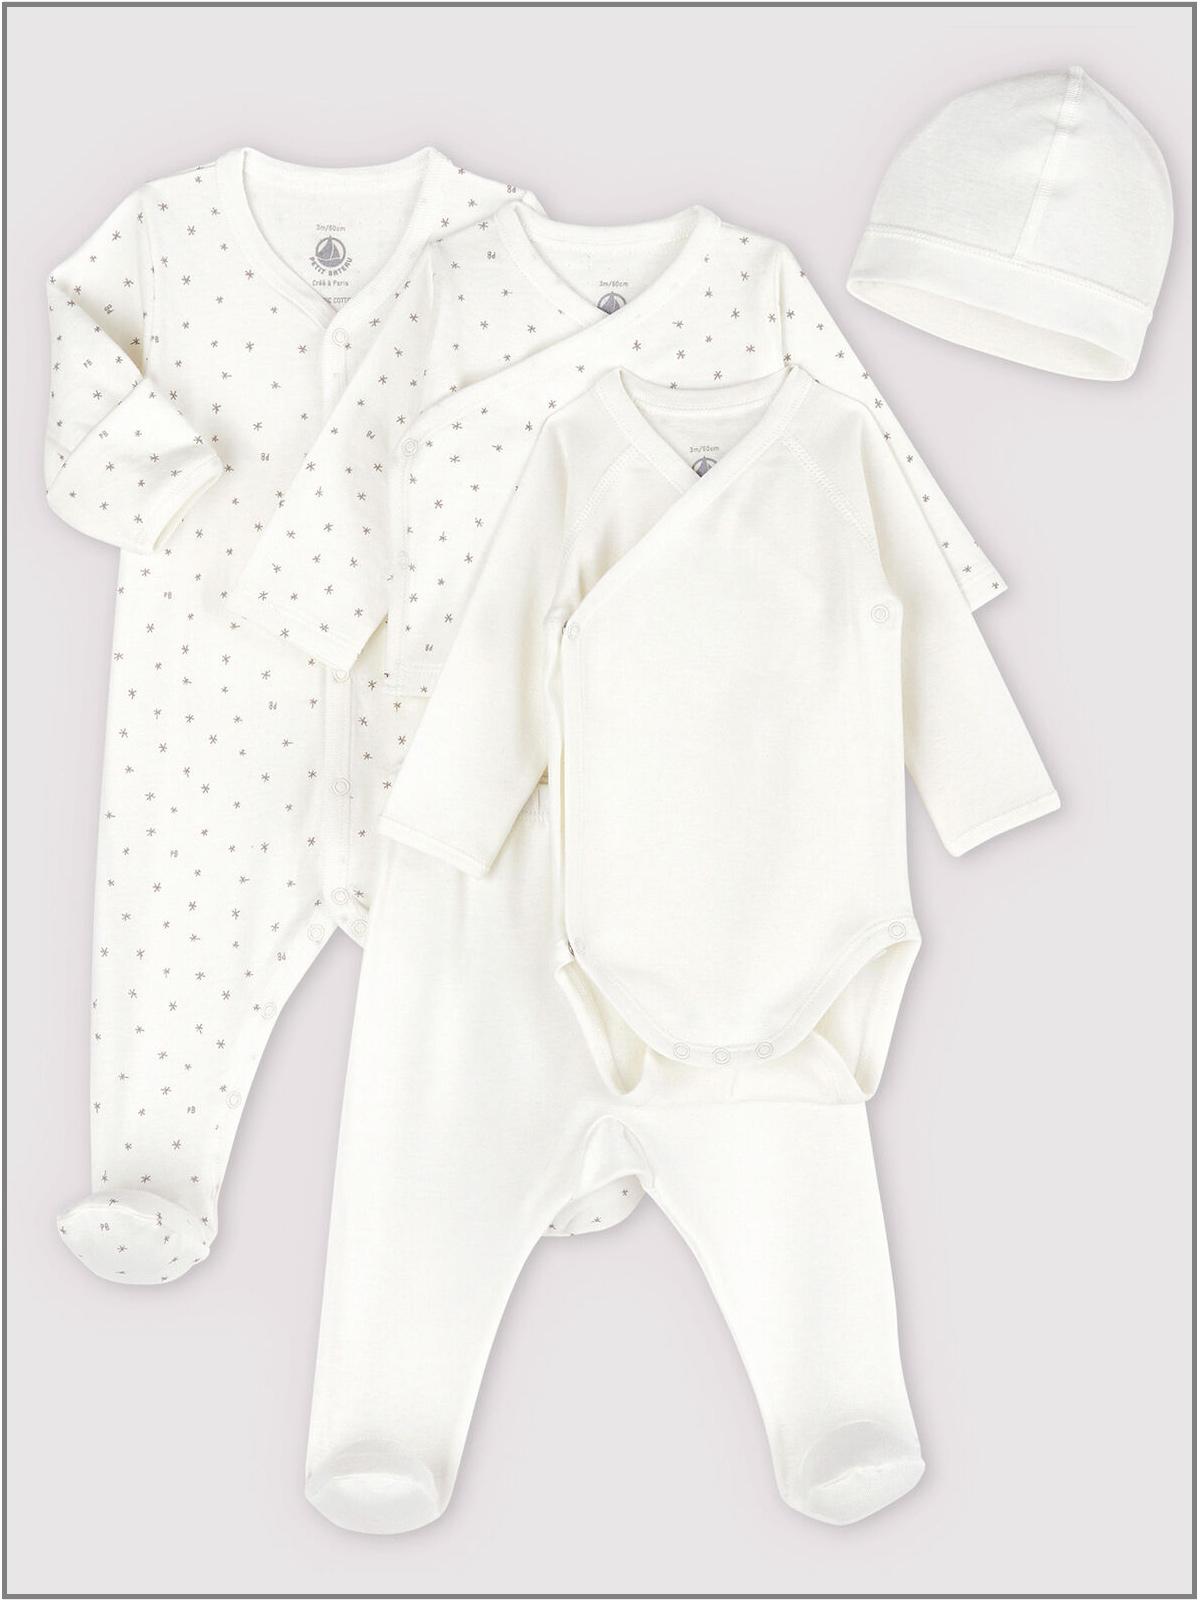 frederickandsophie-kids-soft-wear-petitbateau-france-newborn-baby-five-piece-set-organic-cotton